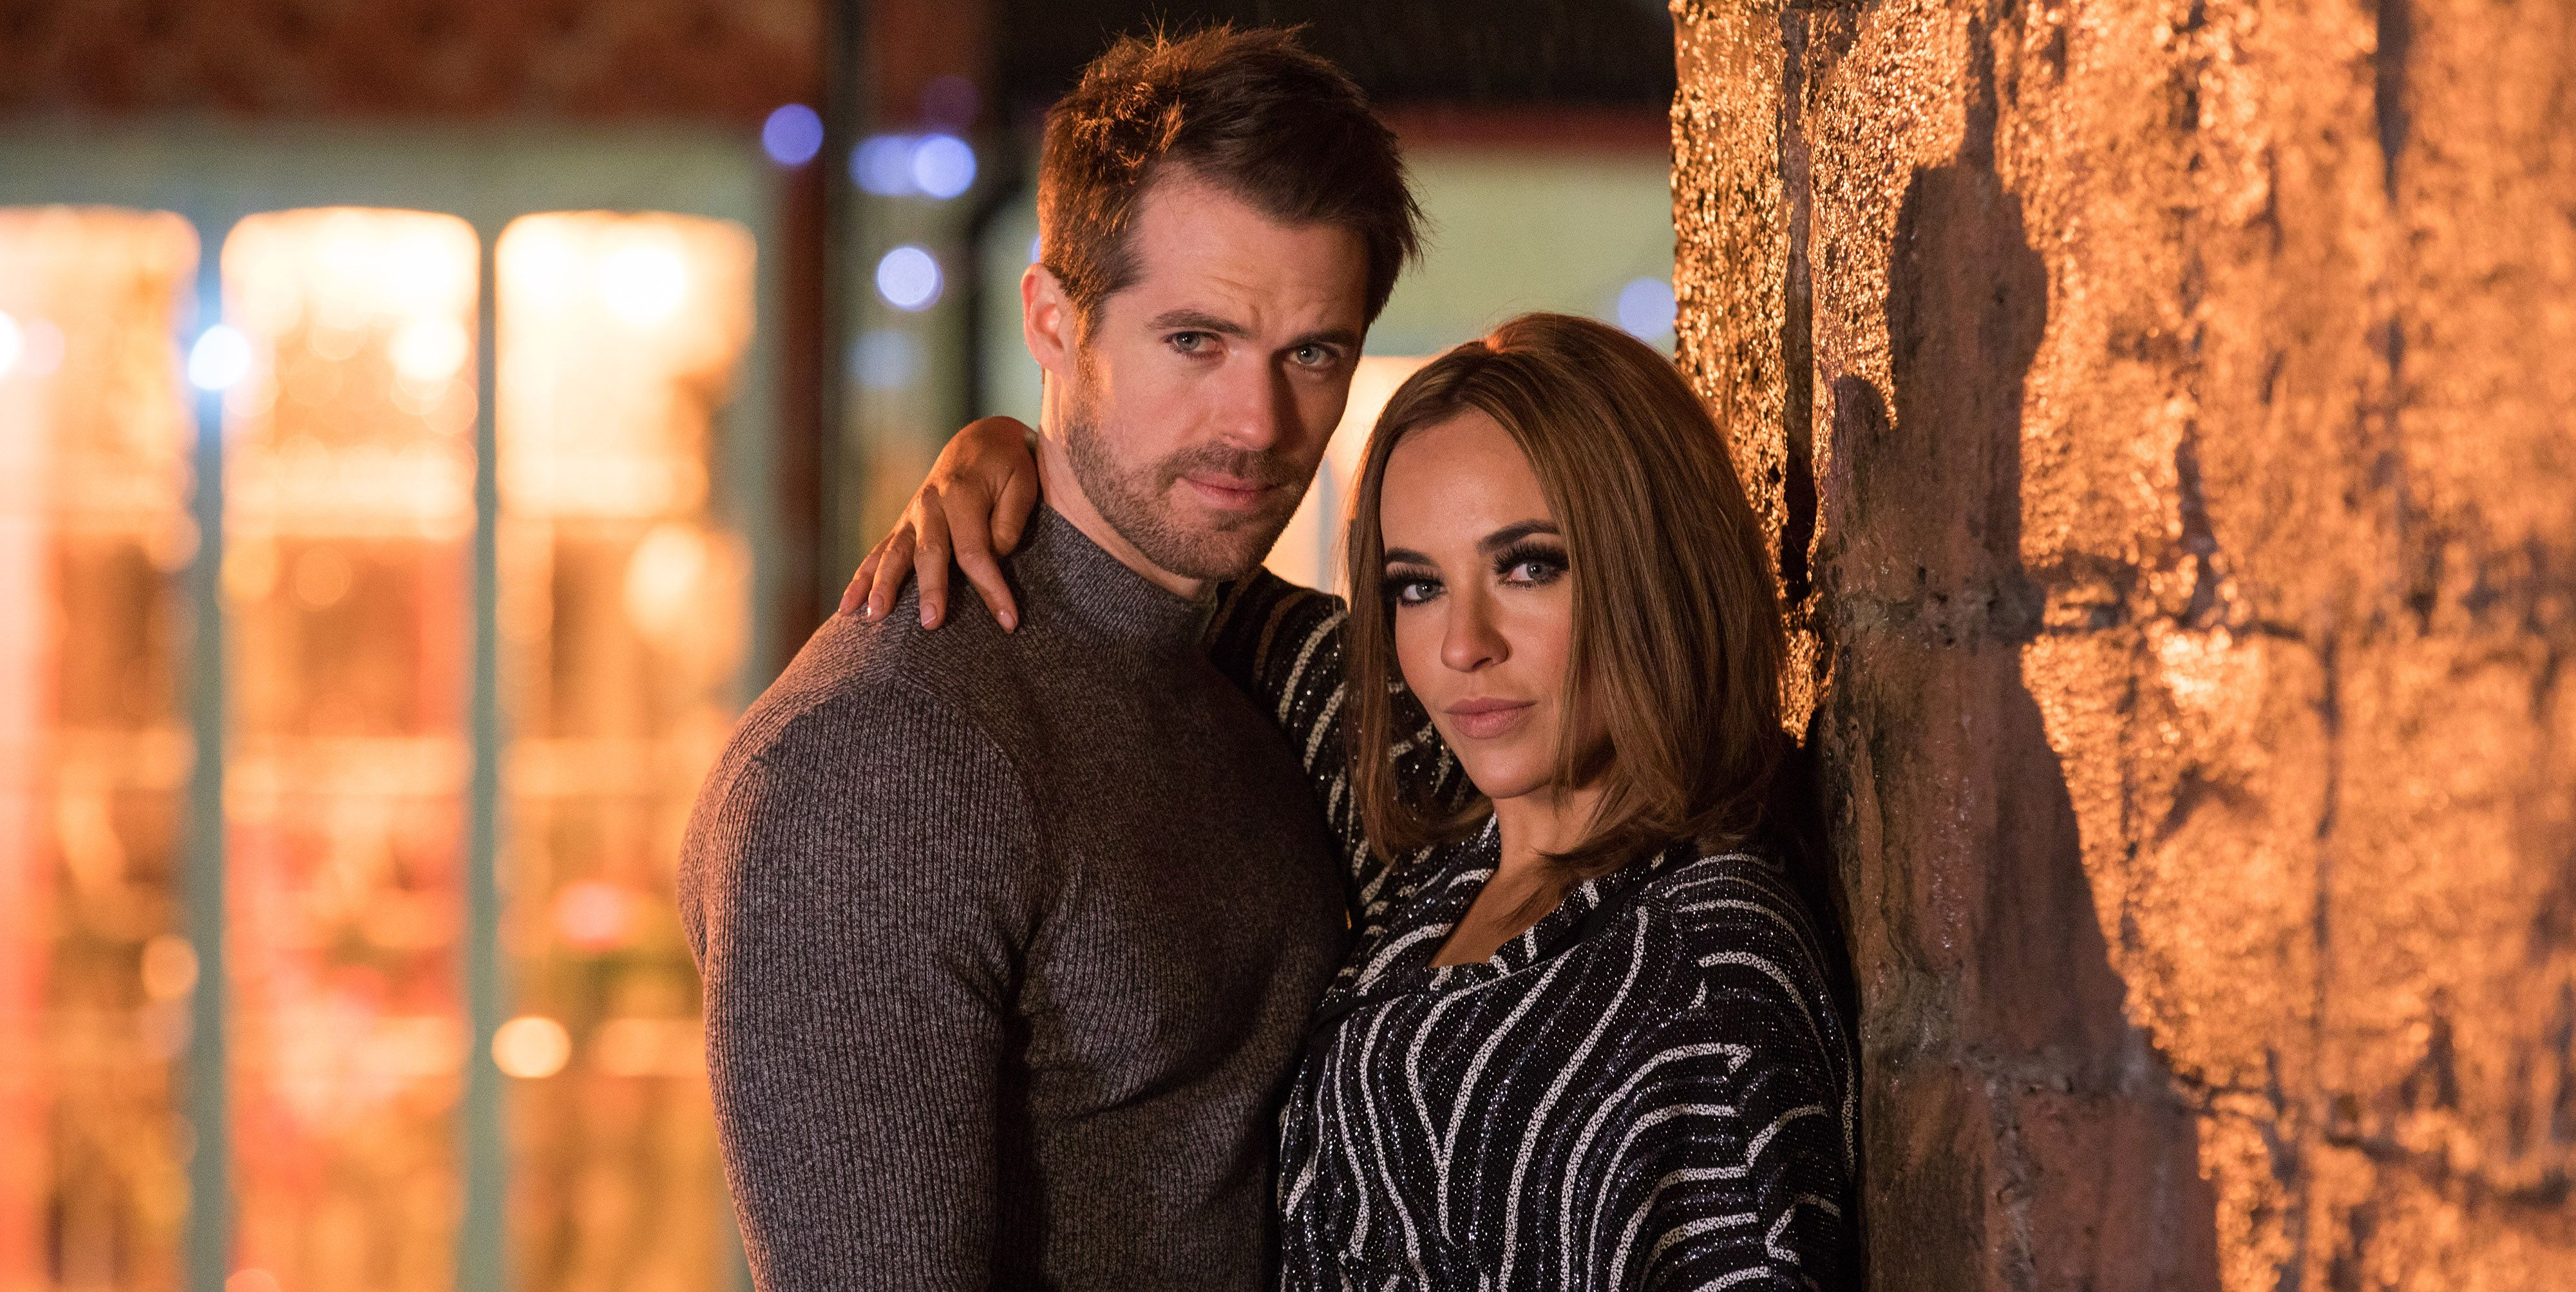 Kyle Pryor and Stephanie Davis as Laurie and Sinead Shelby in Hollyoaks